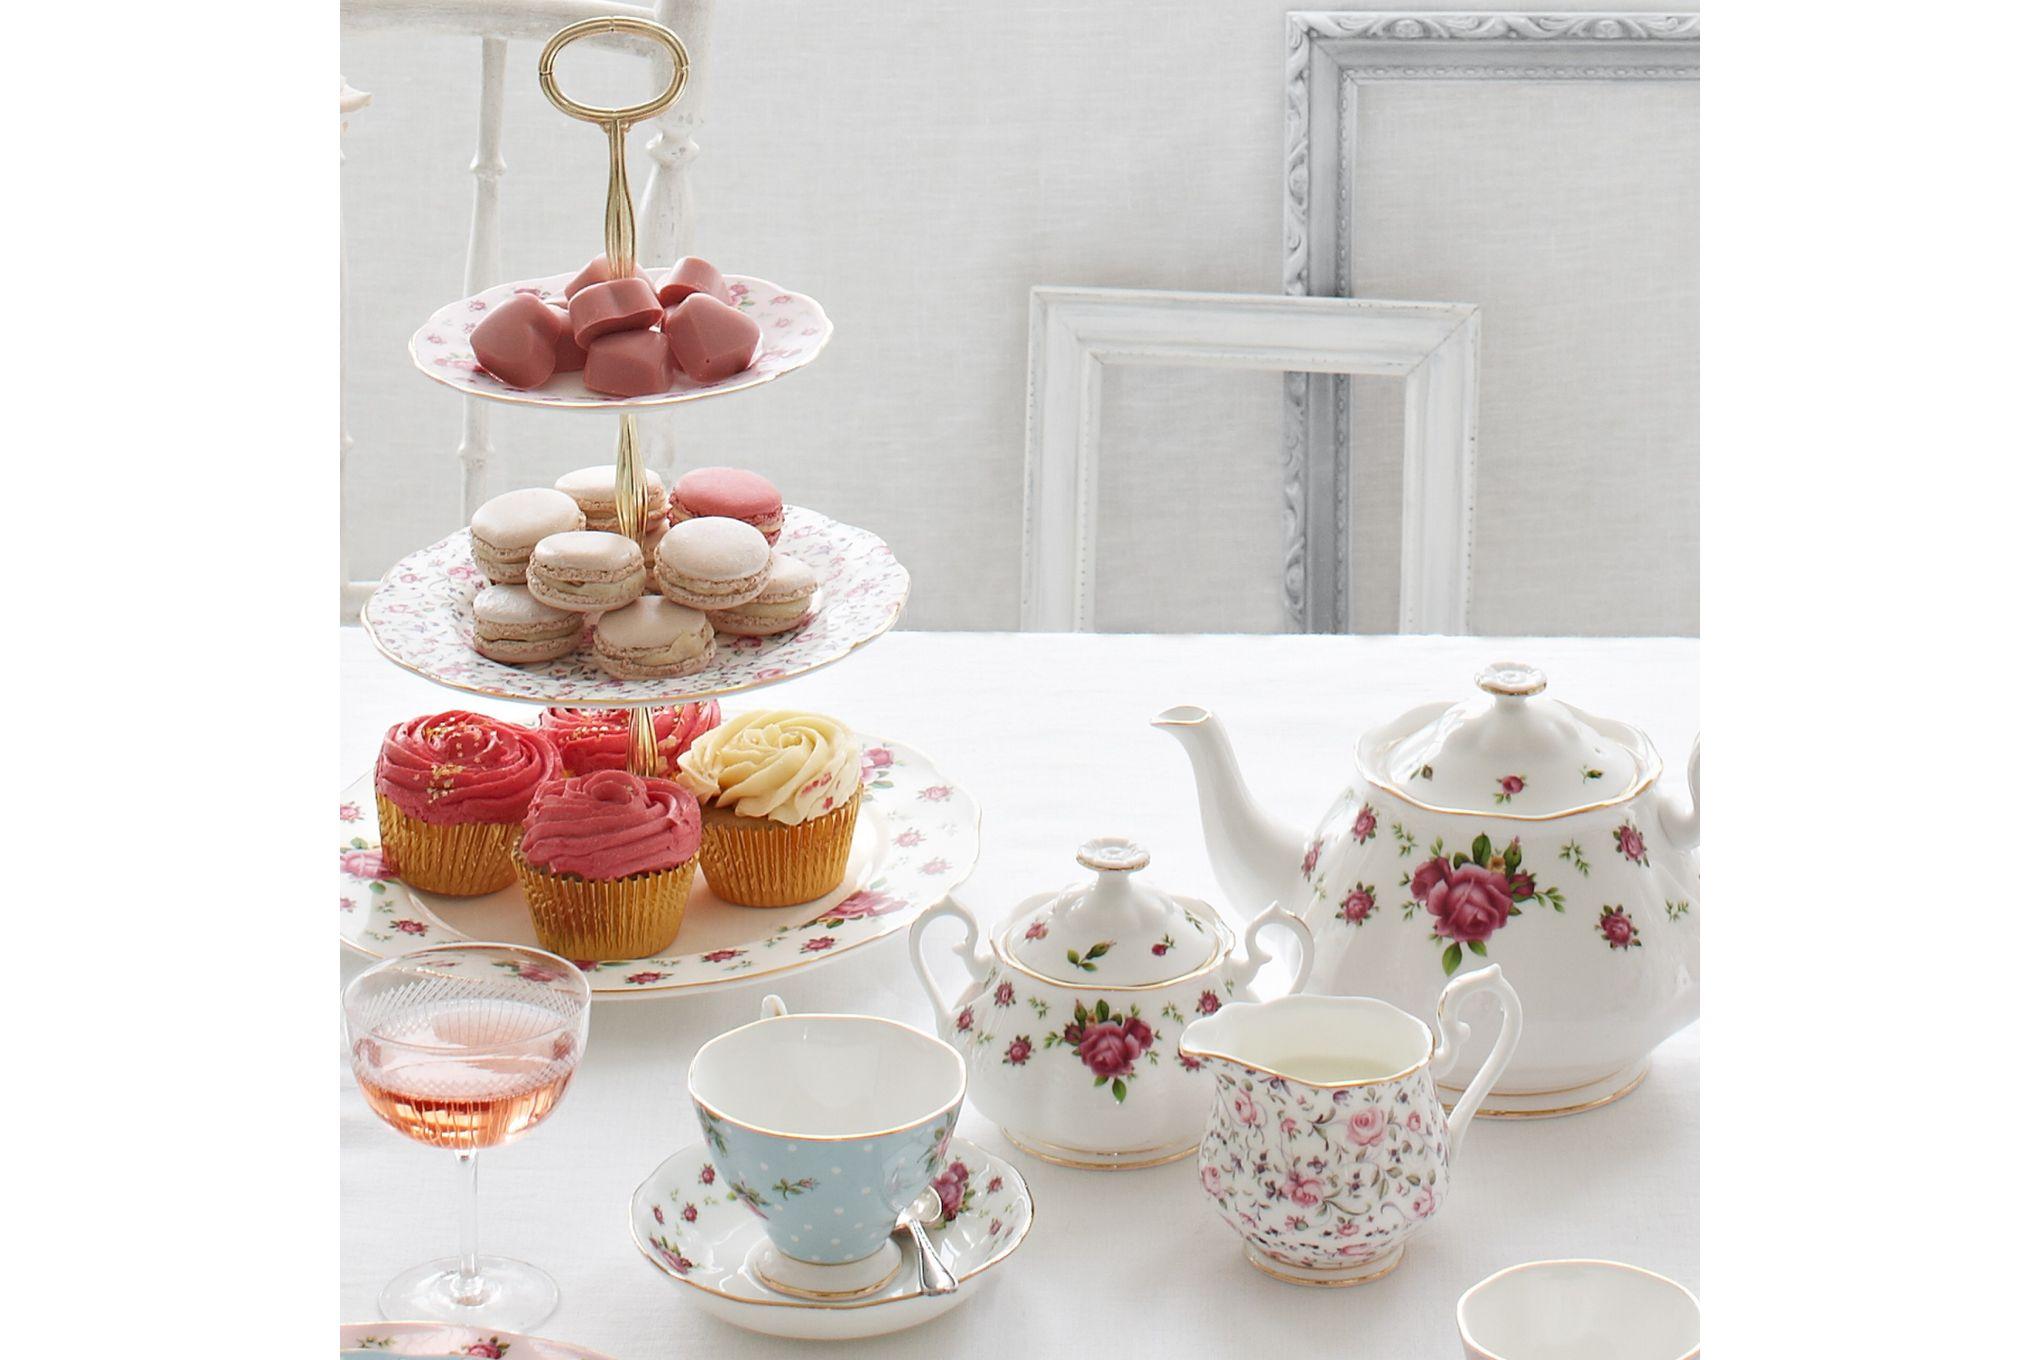 Royal Albert New Country Roses White 3 Piece Tea set Teapot, Sugar, Creamer thumb 2